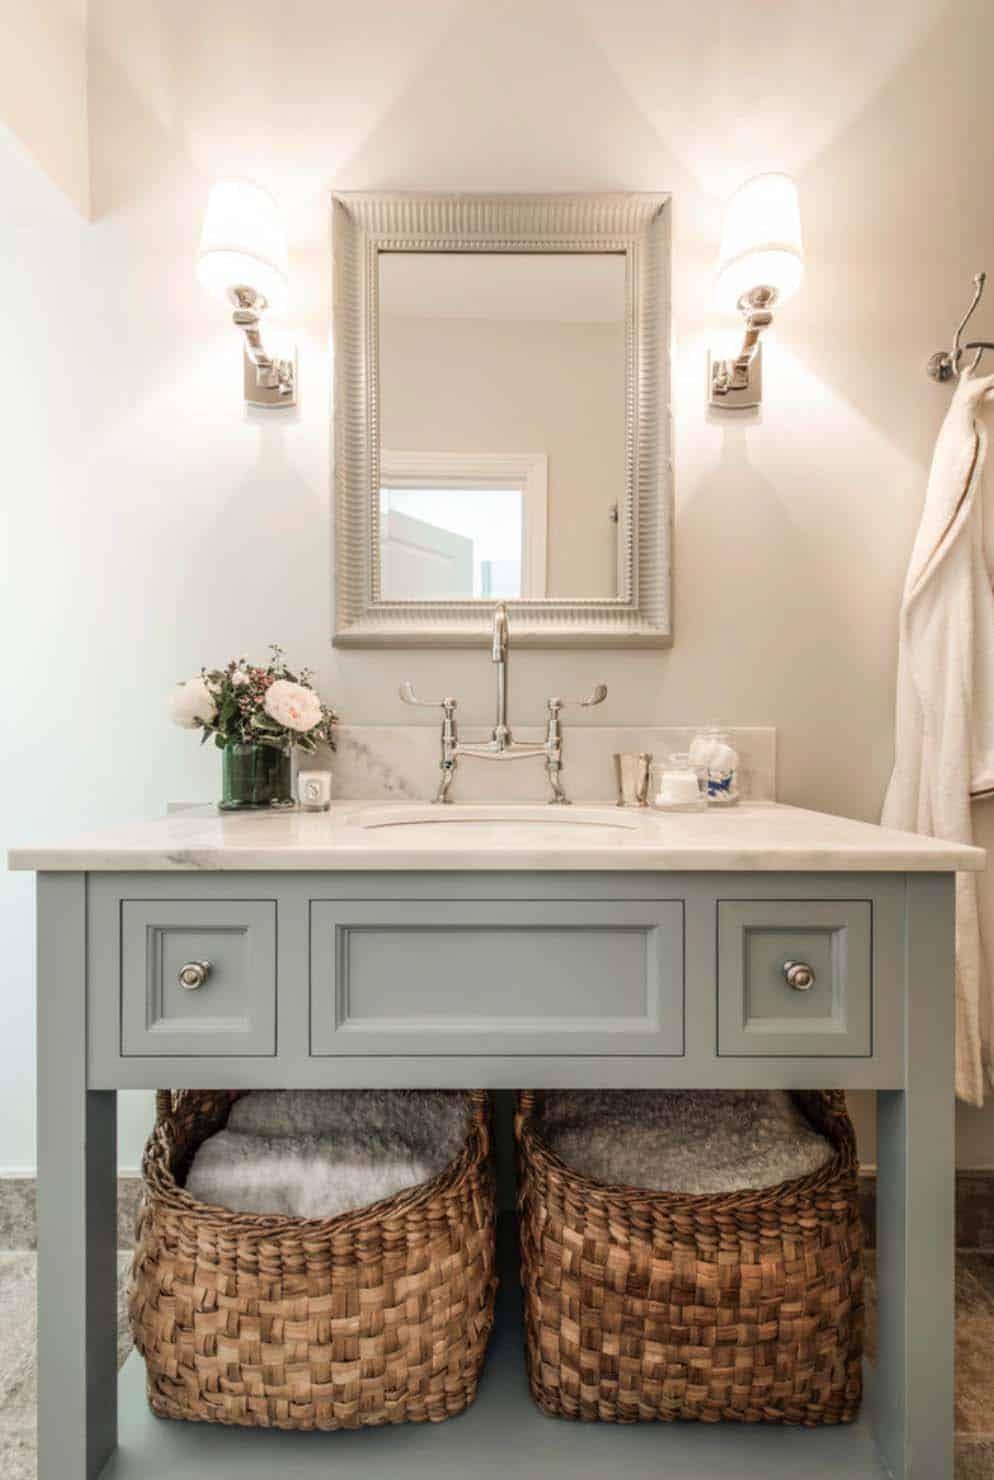 53 Most fabulous traditional style bathroom designs ever on Small:tyud1Zhh6Eq= Bathroom Remodel Ideas  id=93880